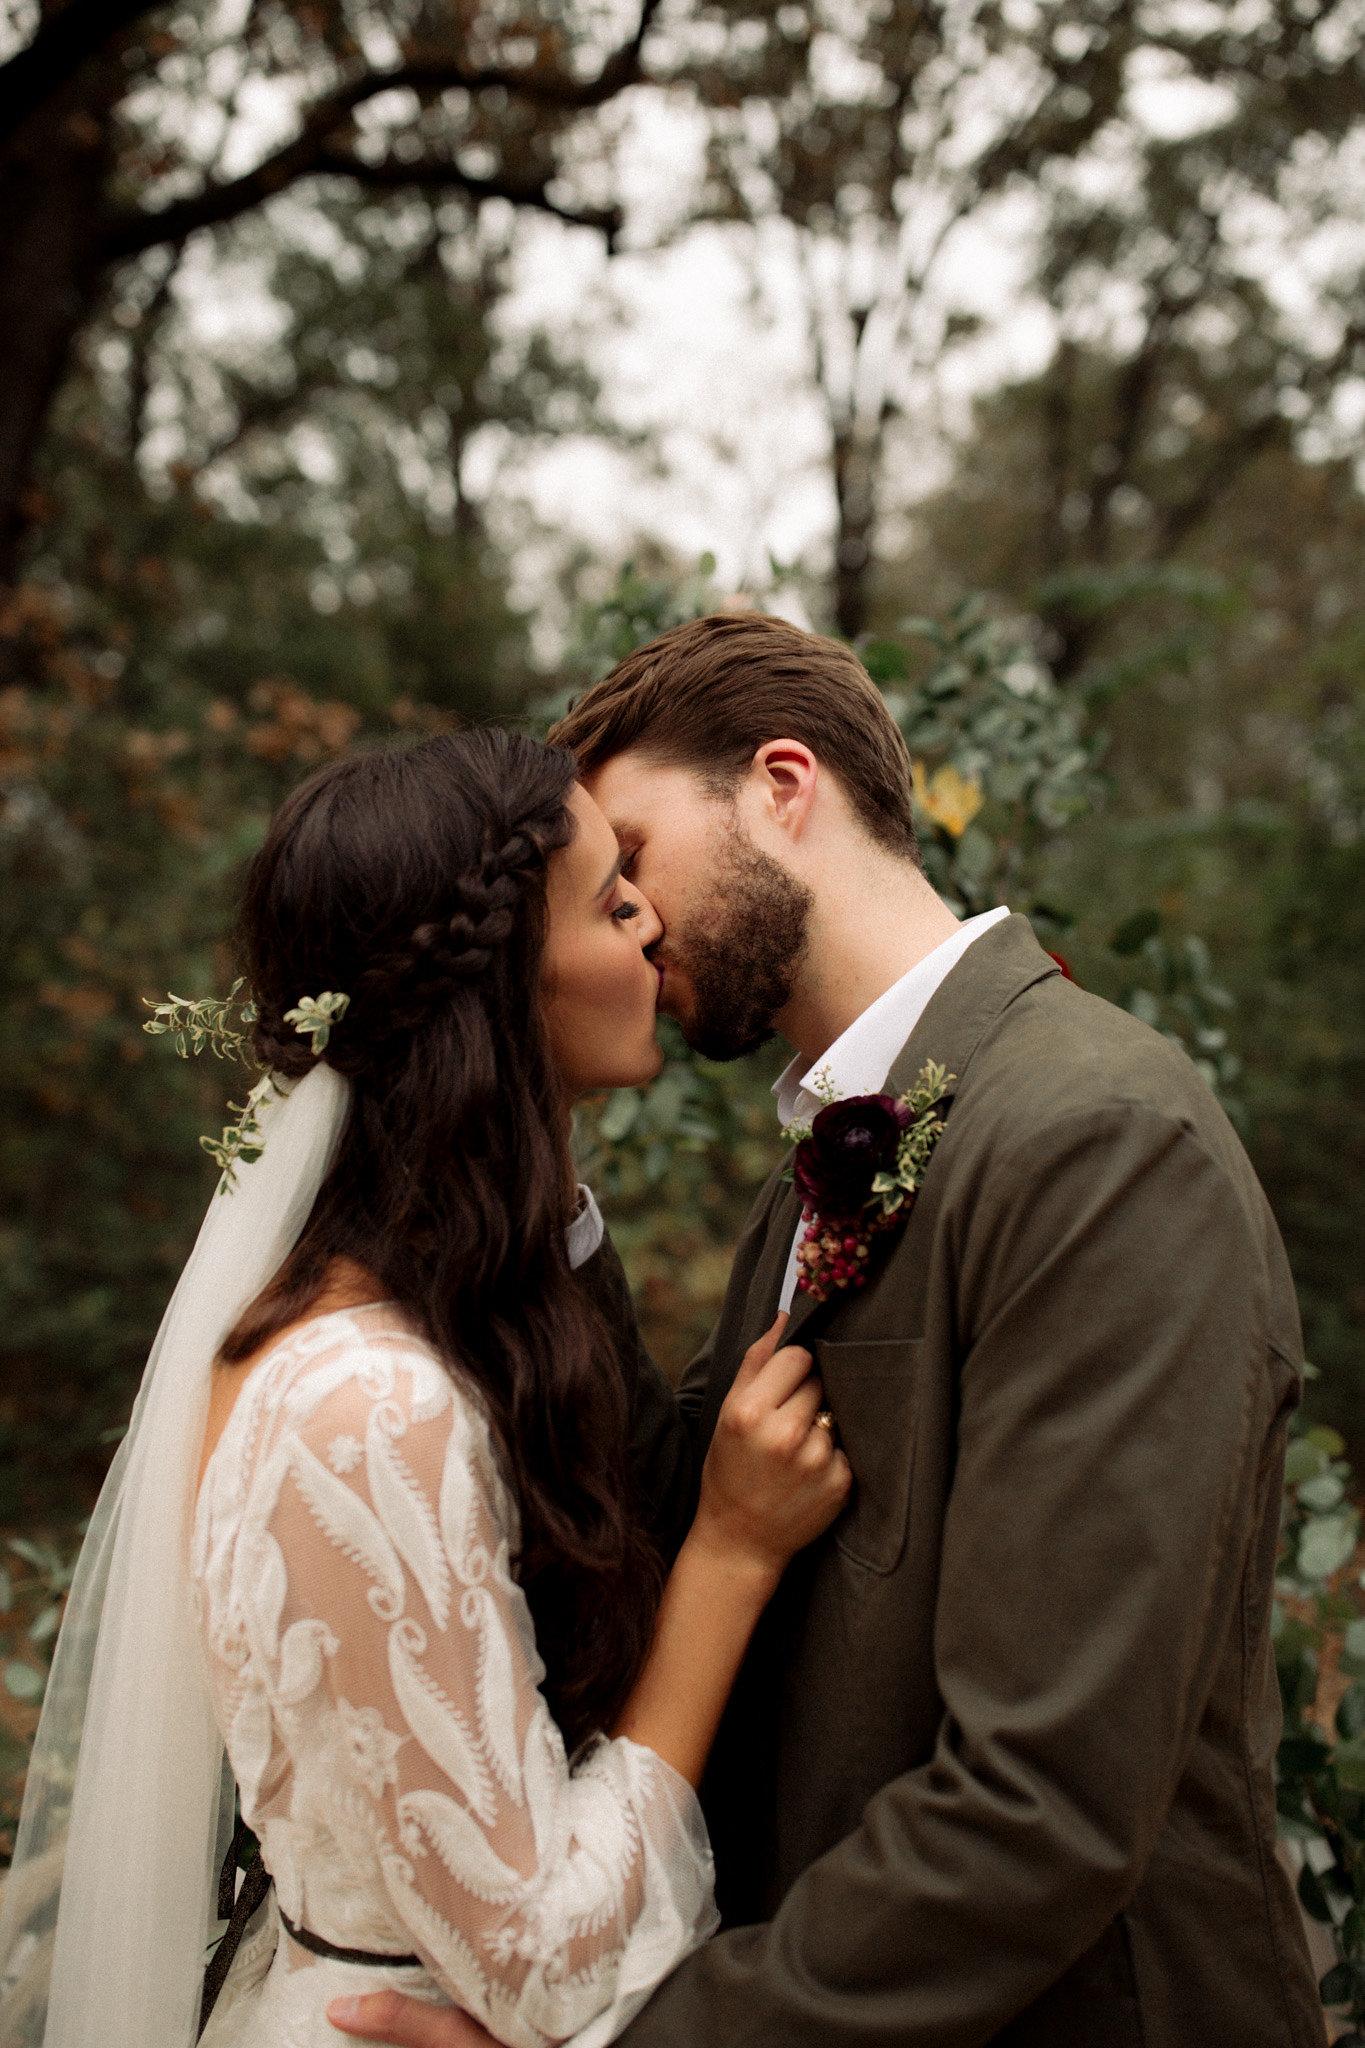 Junebug wedding featured Epoch Co Wedding Planner at Ronin Farm